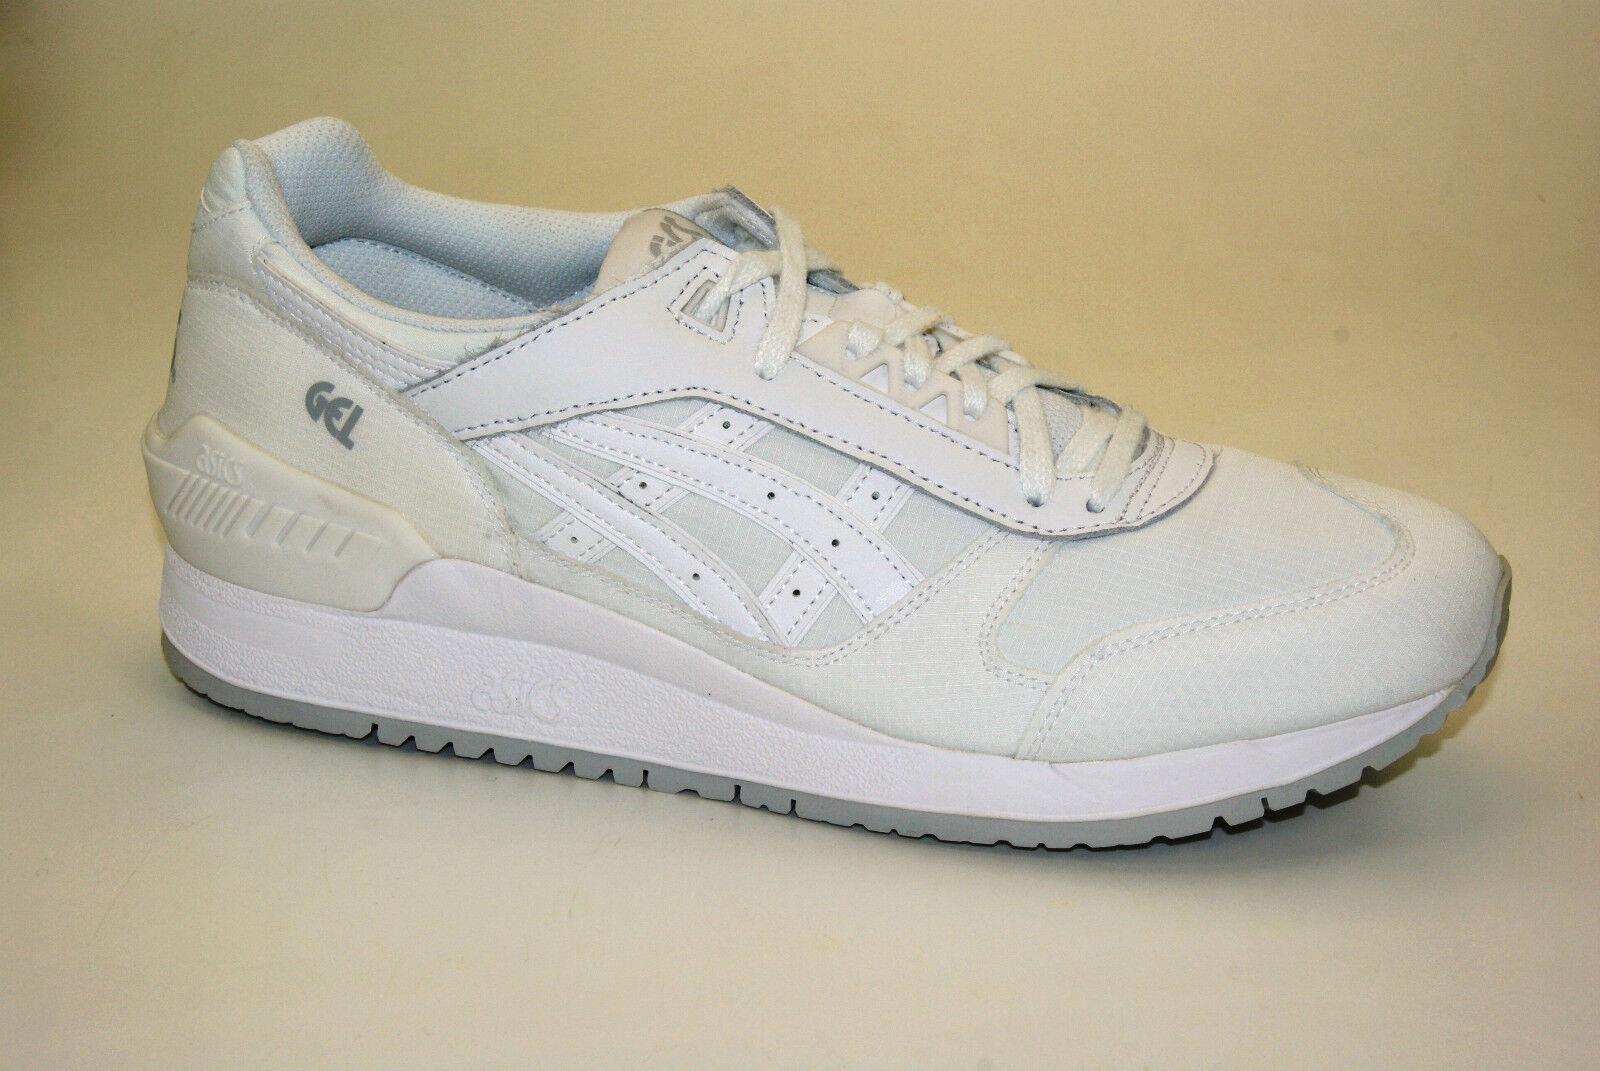 Asics Gel Respector Trainers Sport Shoes Loafers Men Women's Sneakers